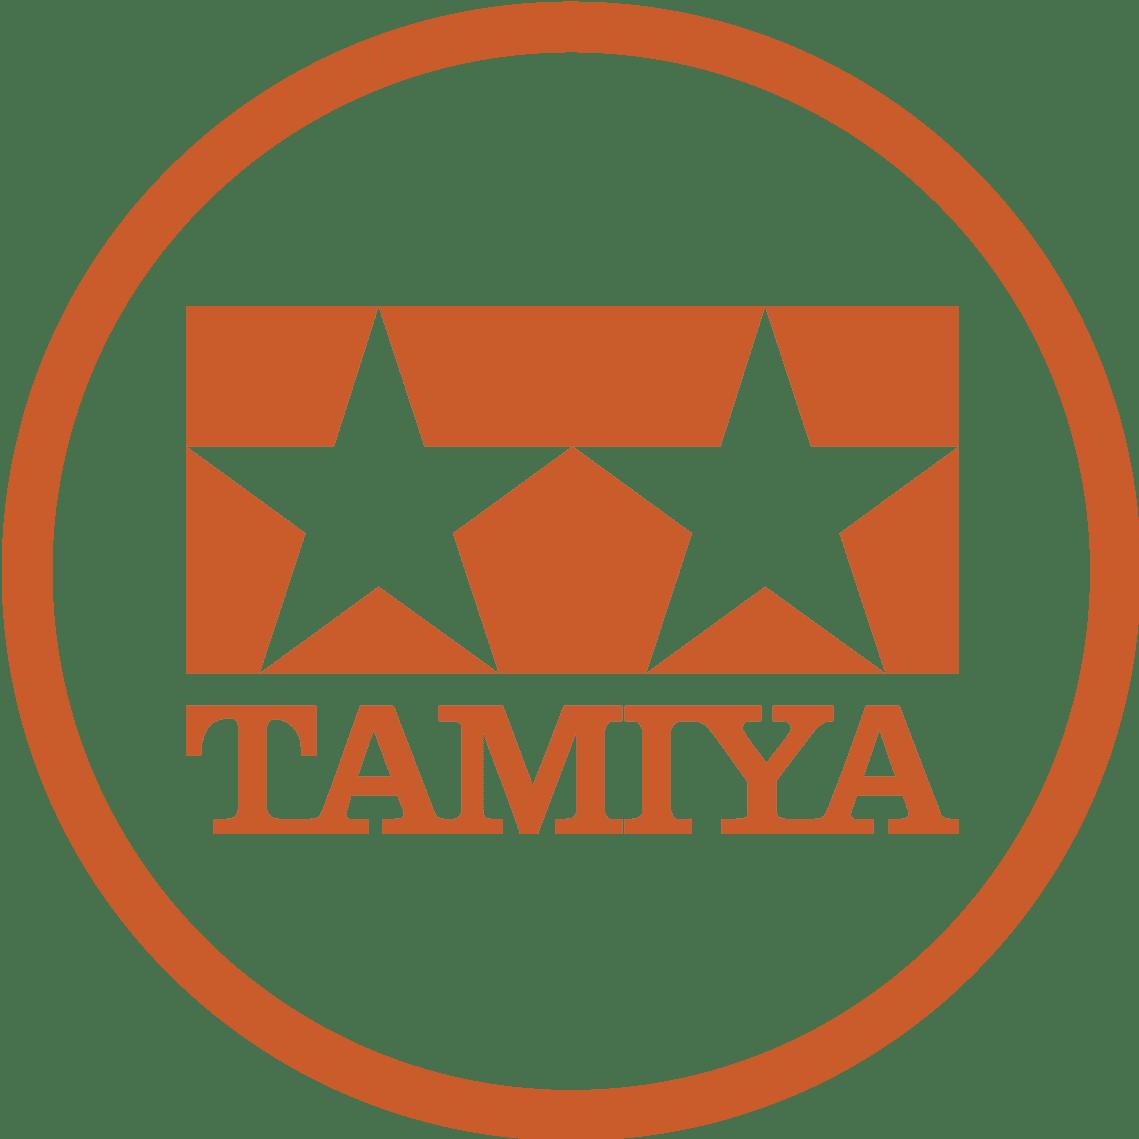 tamiya ak-interactive